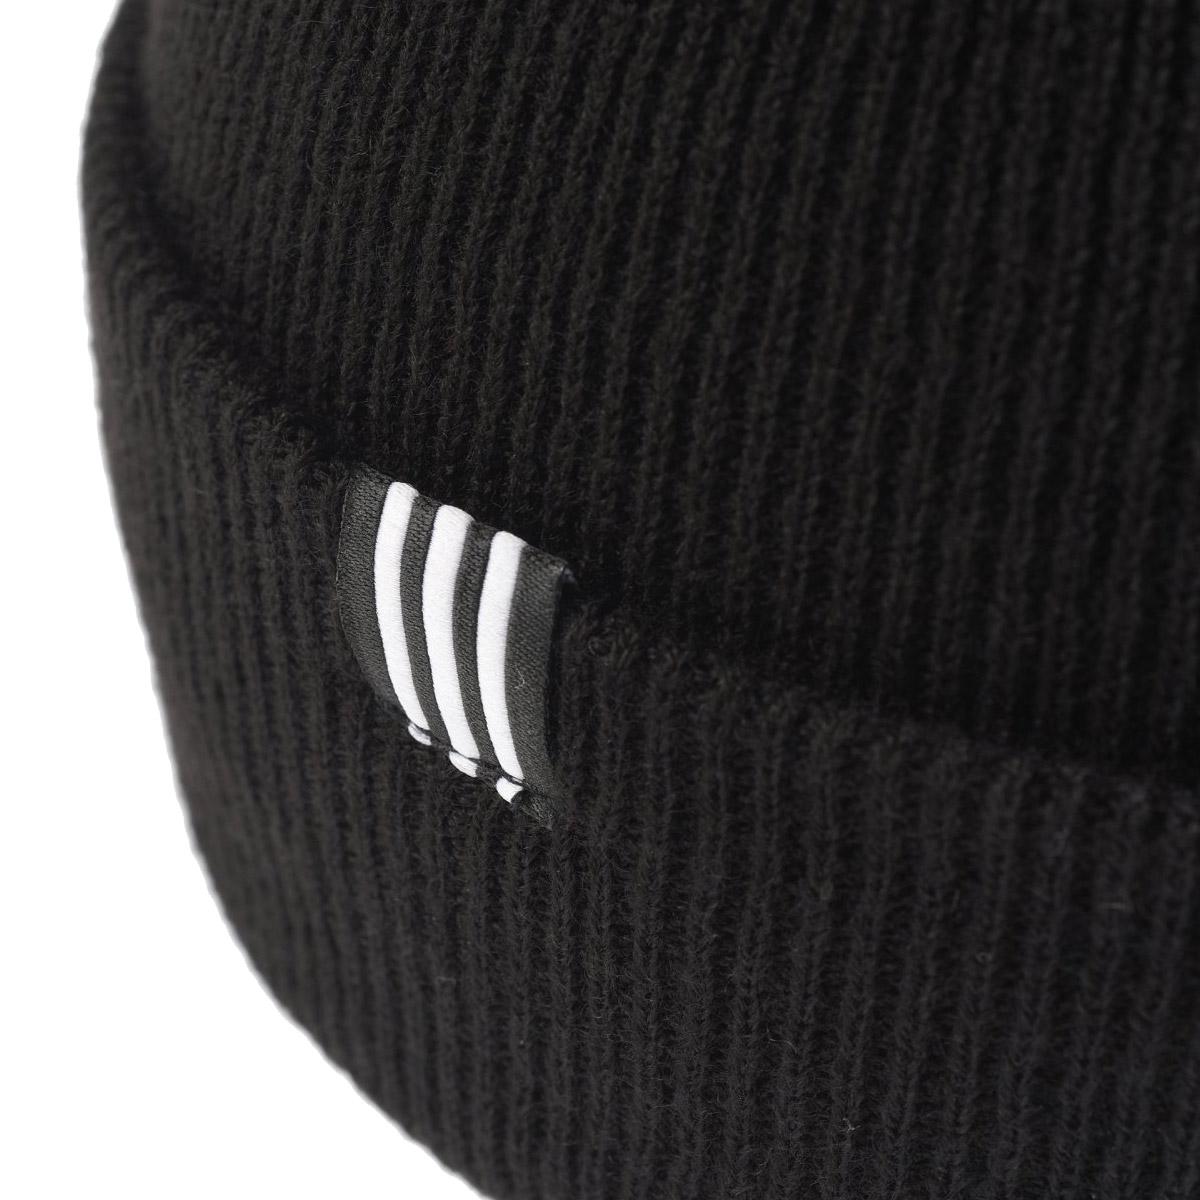 9273843b118 adidas Originals TREFOIL BEANIE (アディダスオリジナルストレフォイルビーニー) Black 18SP-S